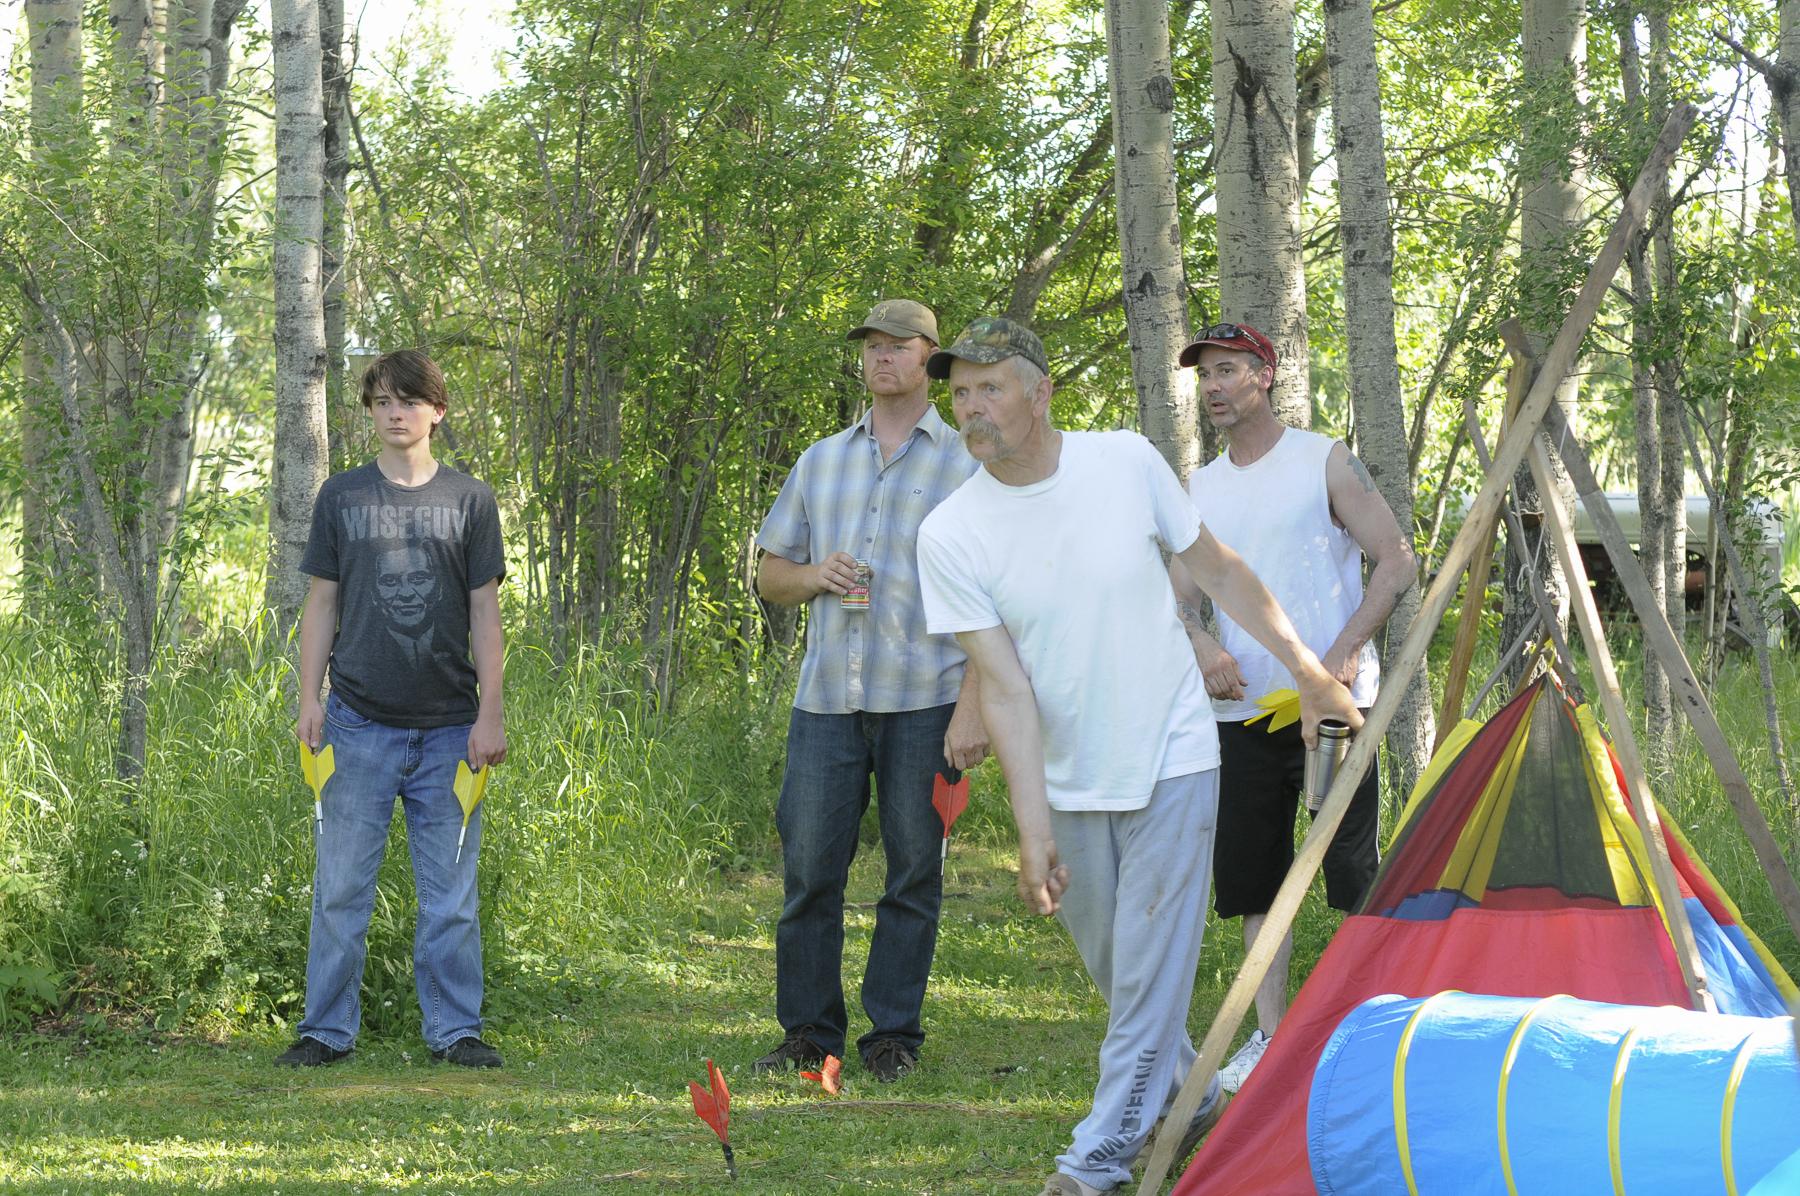 Lawn Darts game